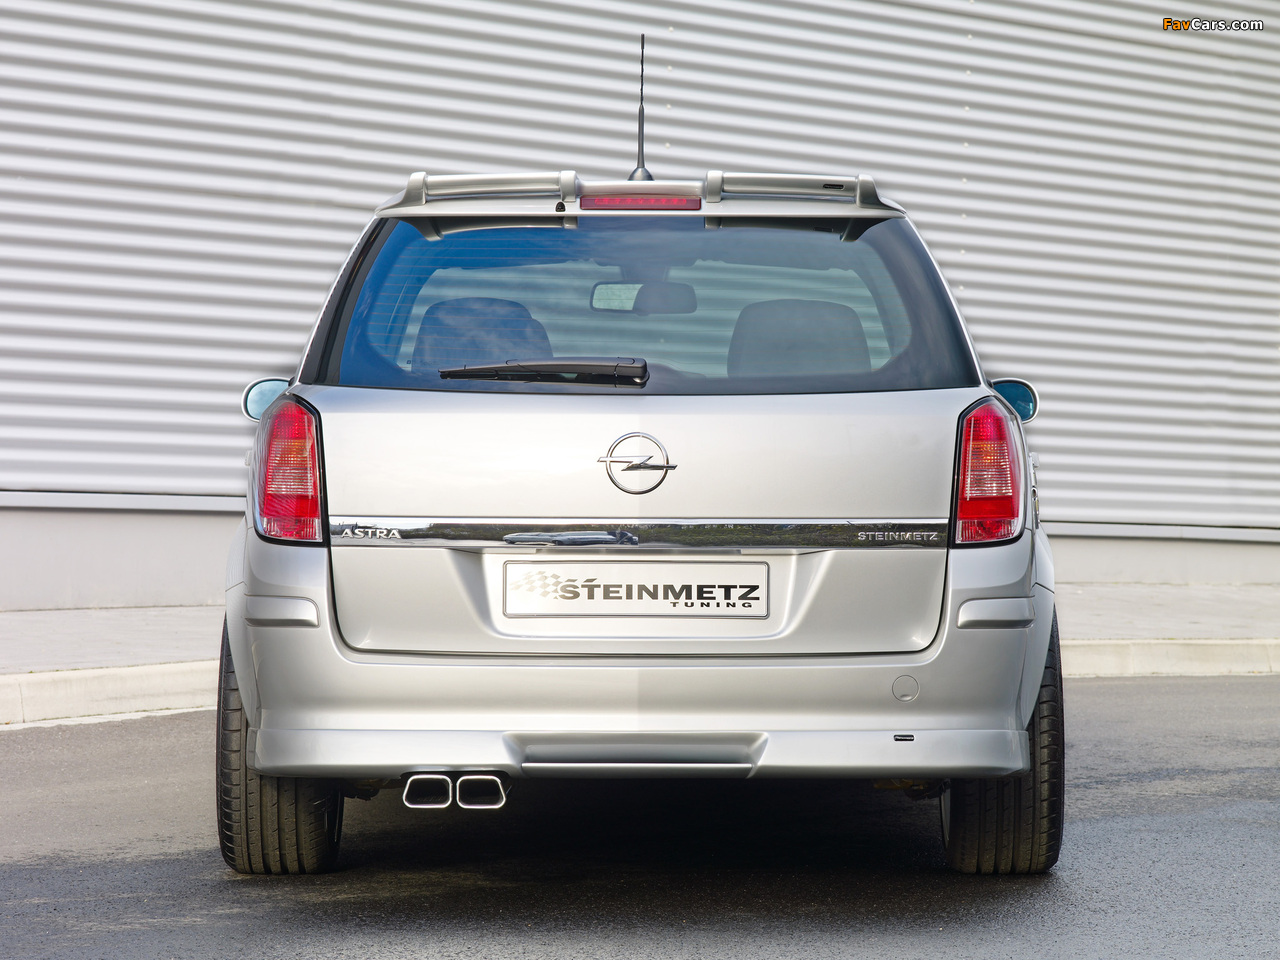 Steinmetz Opel Astra Caravan (H) 2007 images (1280 x 960)